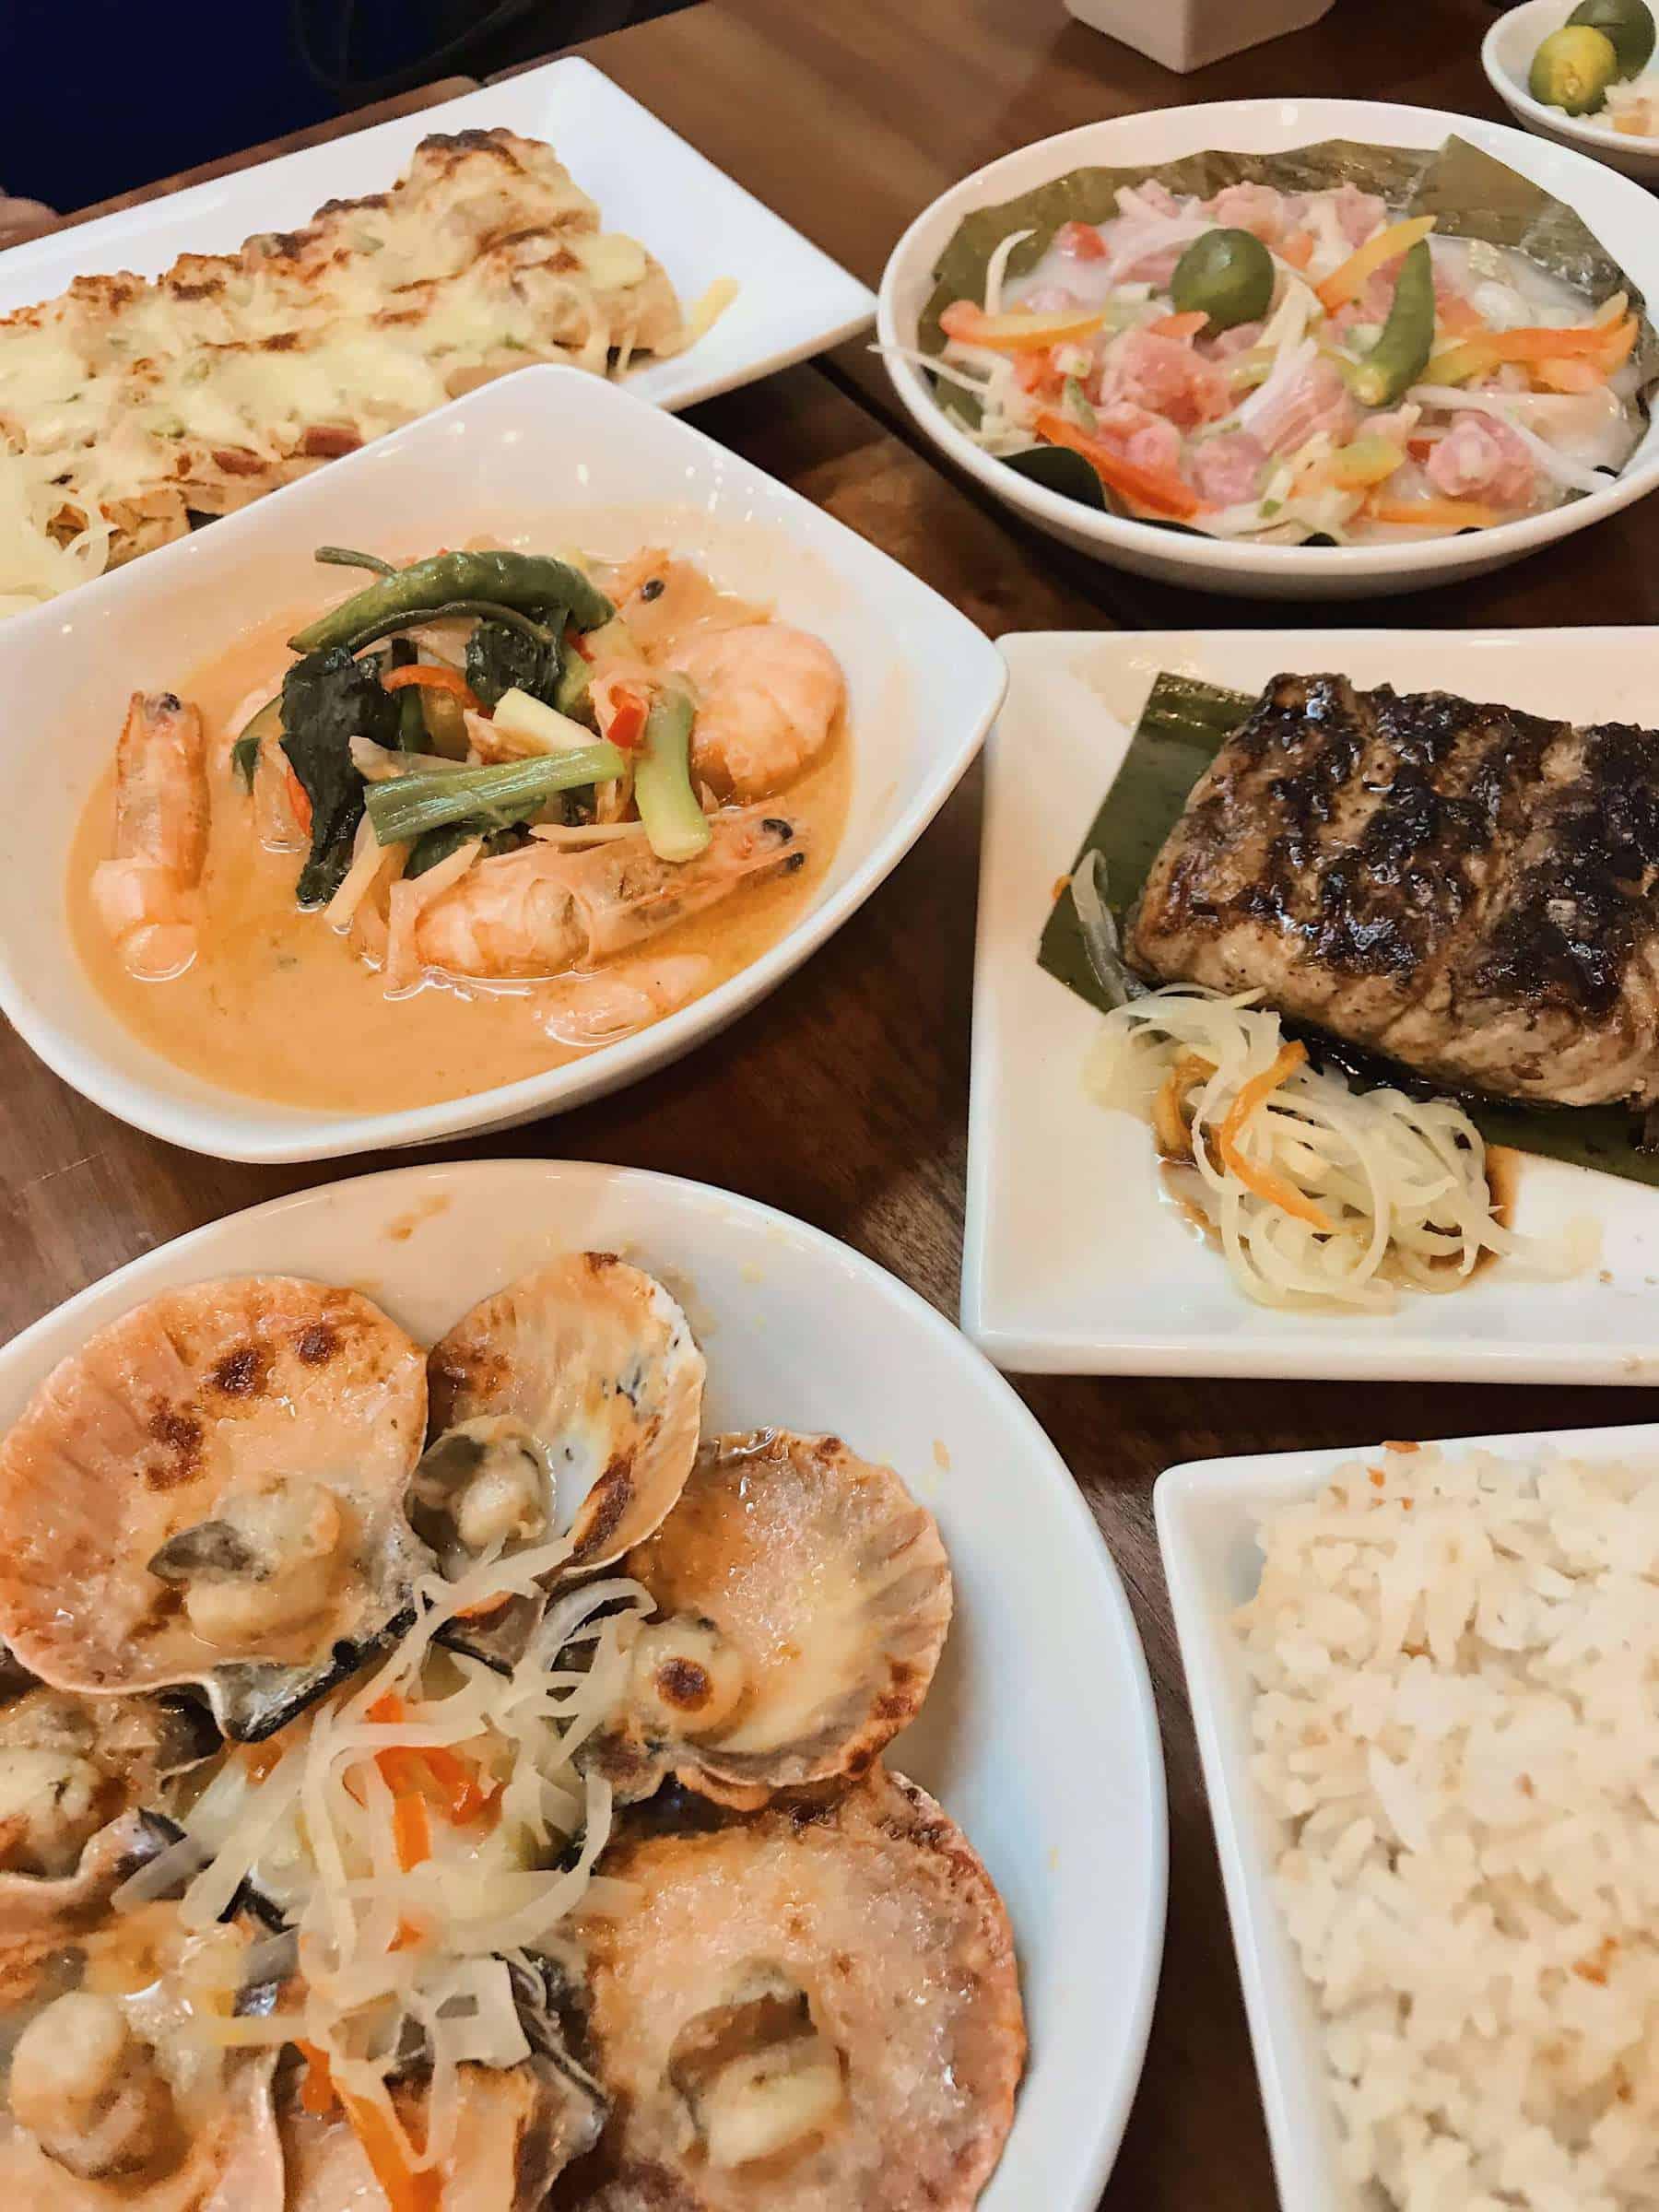 Best Budget Restaurants in Cebu: A Local Food Guide - Mad Monkey Hostels